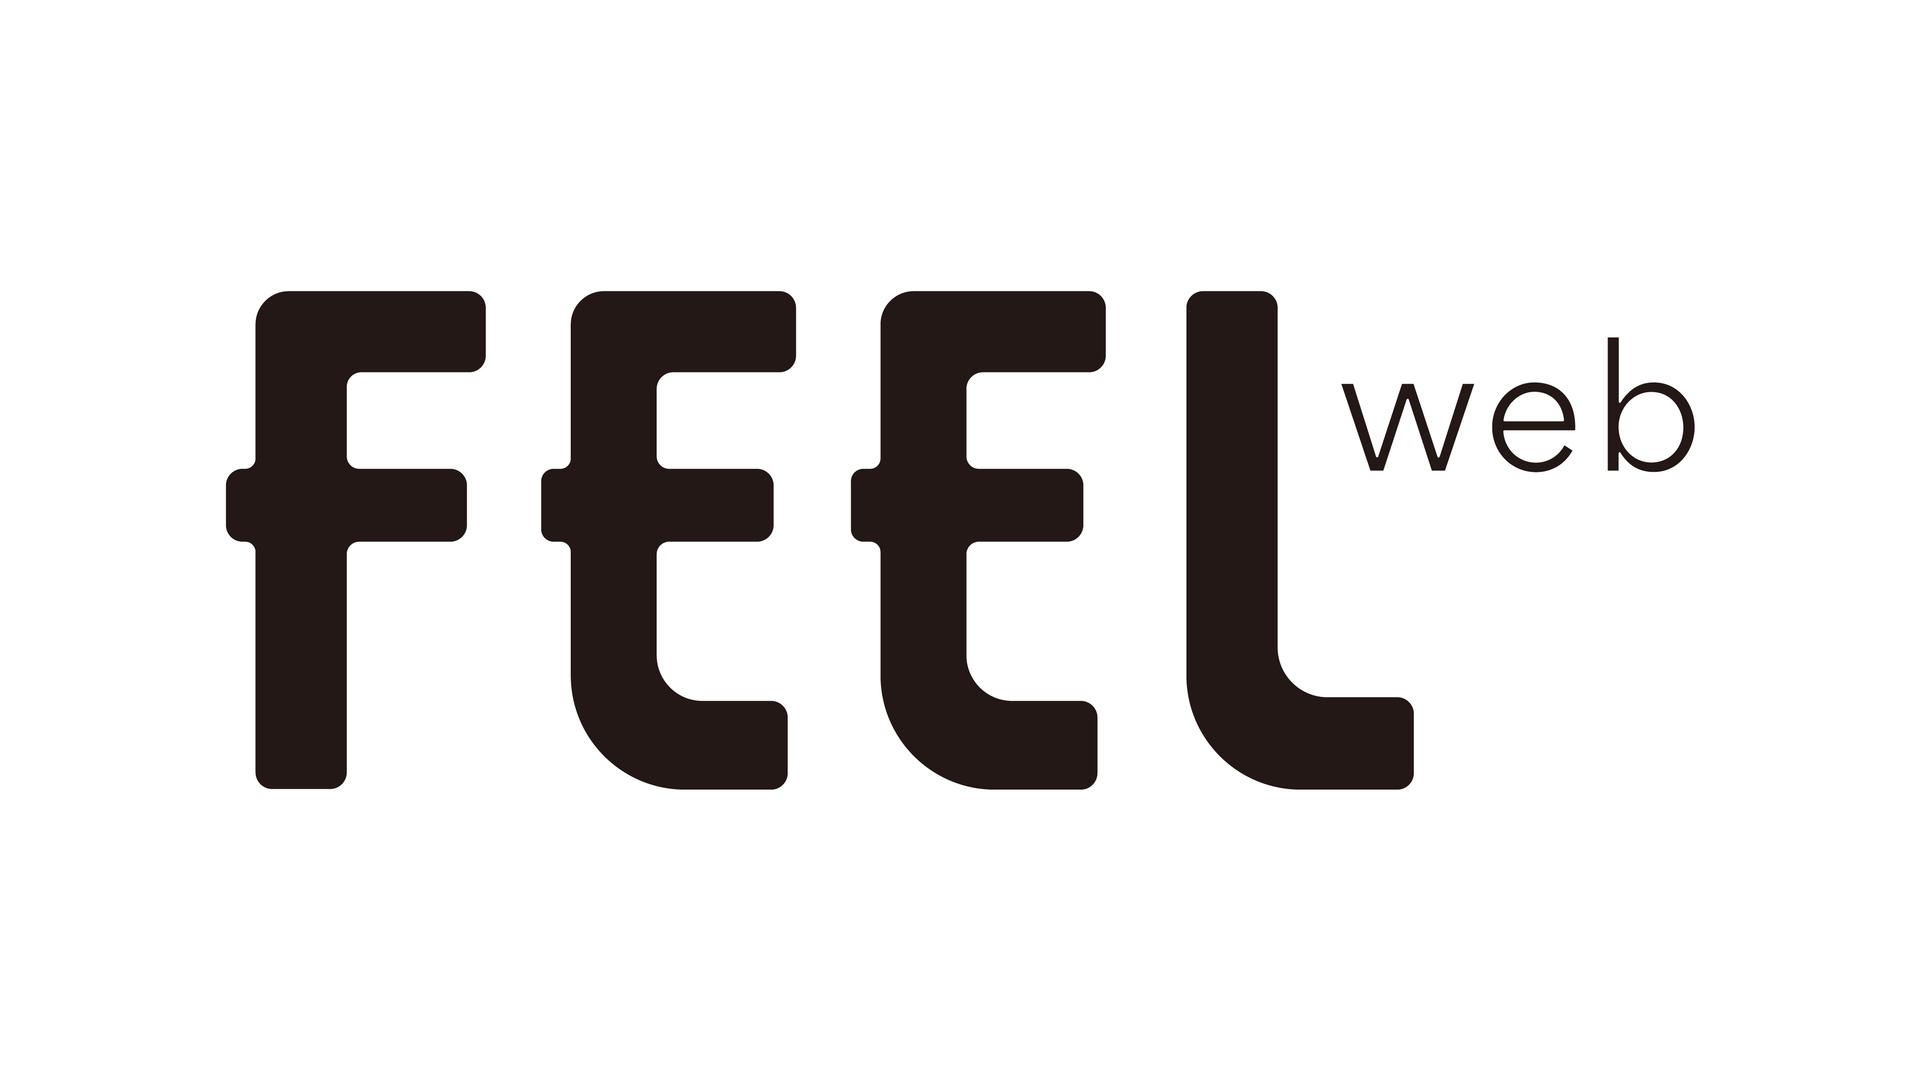 FEELwebLOGO.jpg